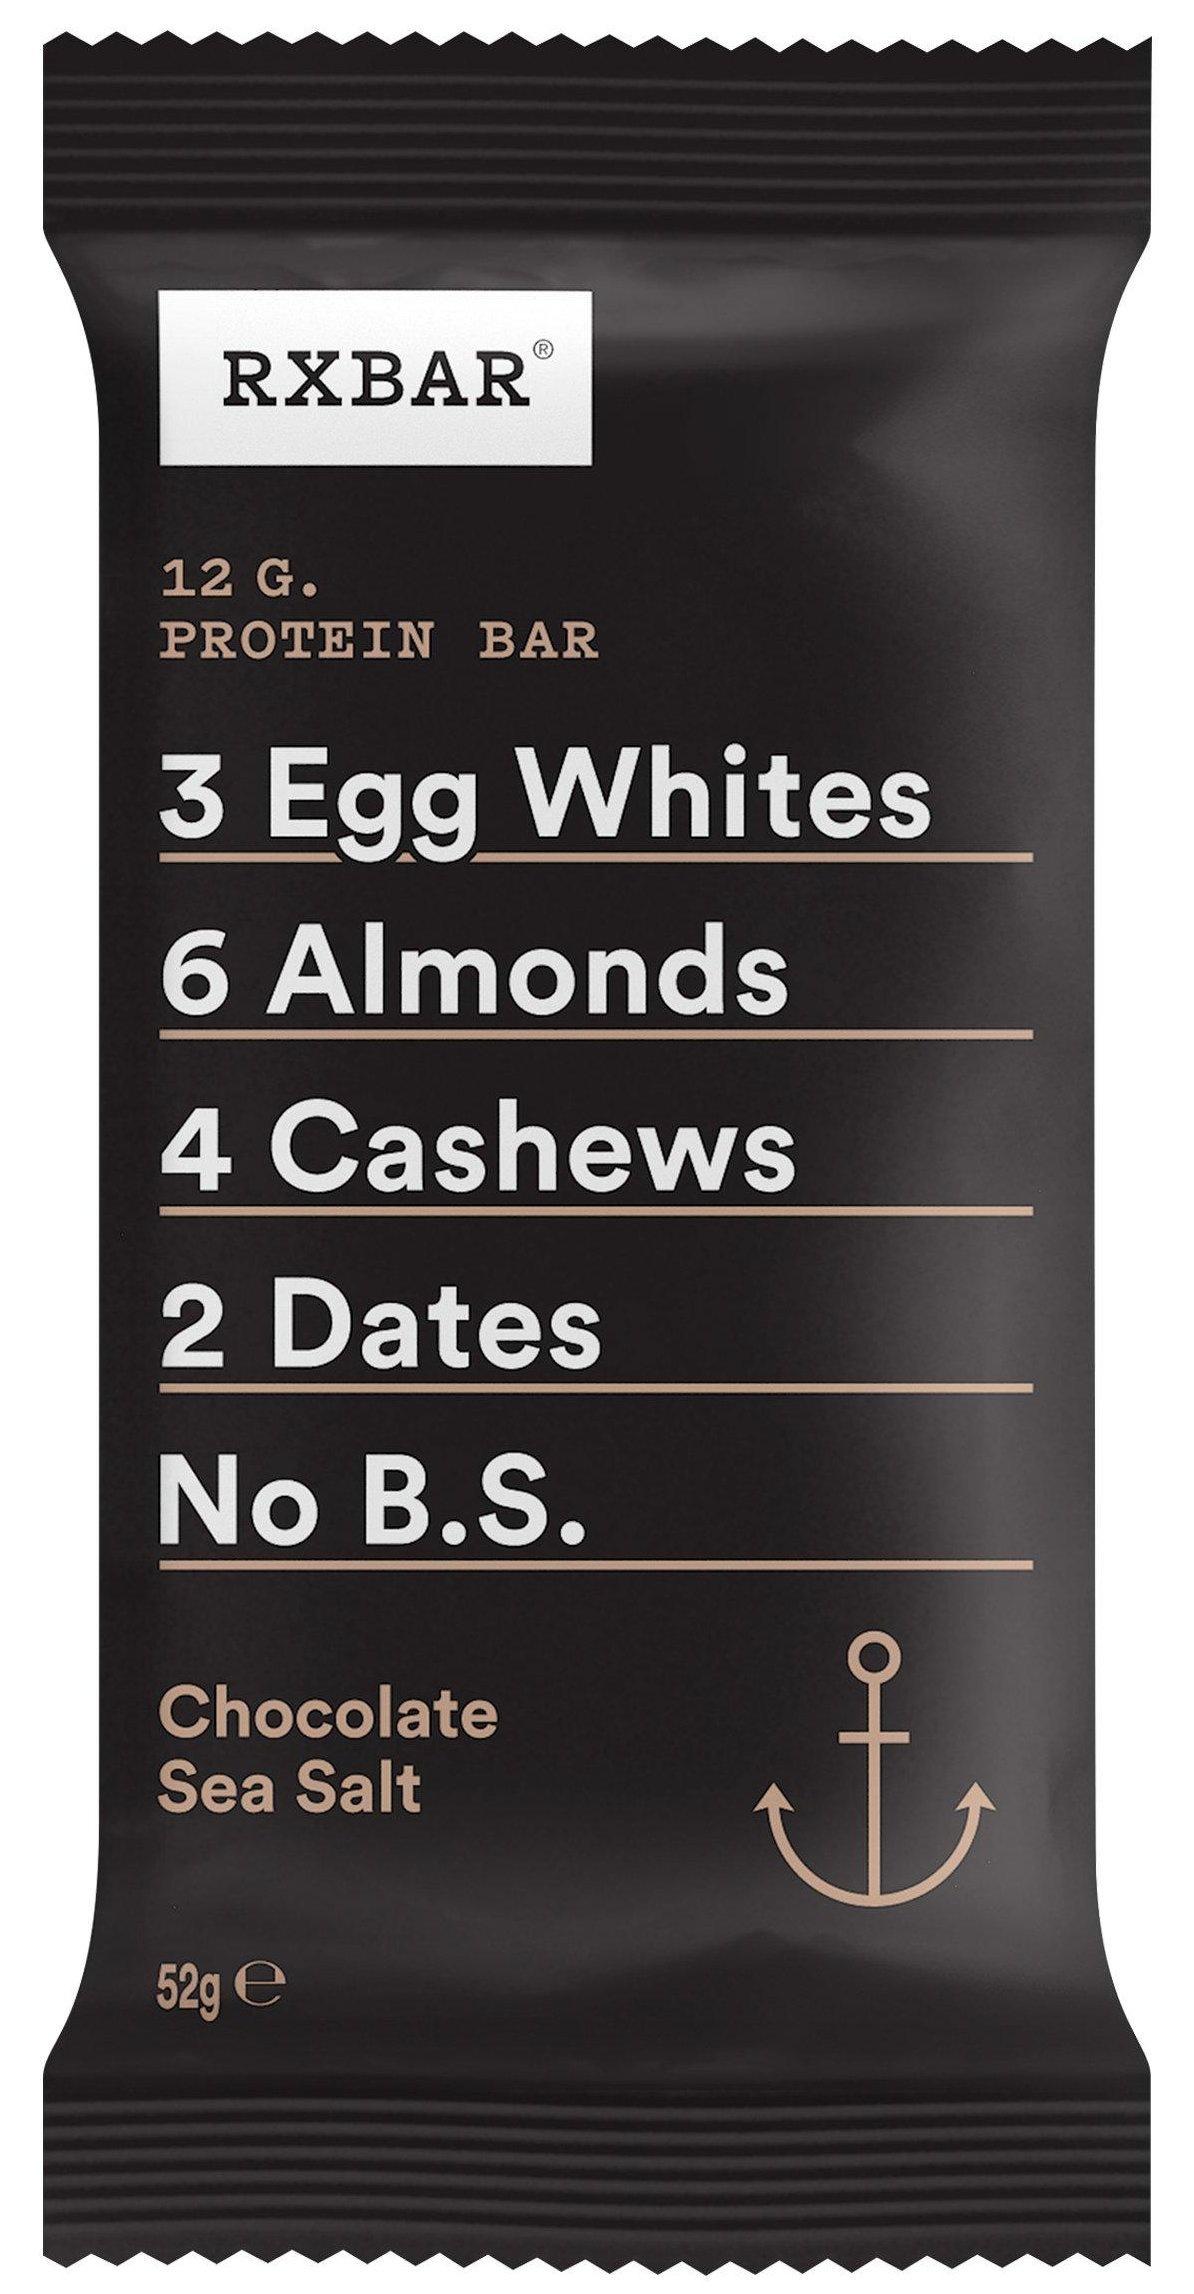 RXBAR Proteinbar Chocolate Sea Salt